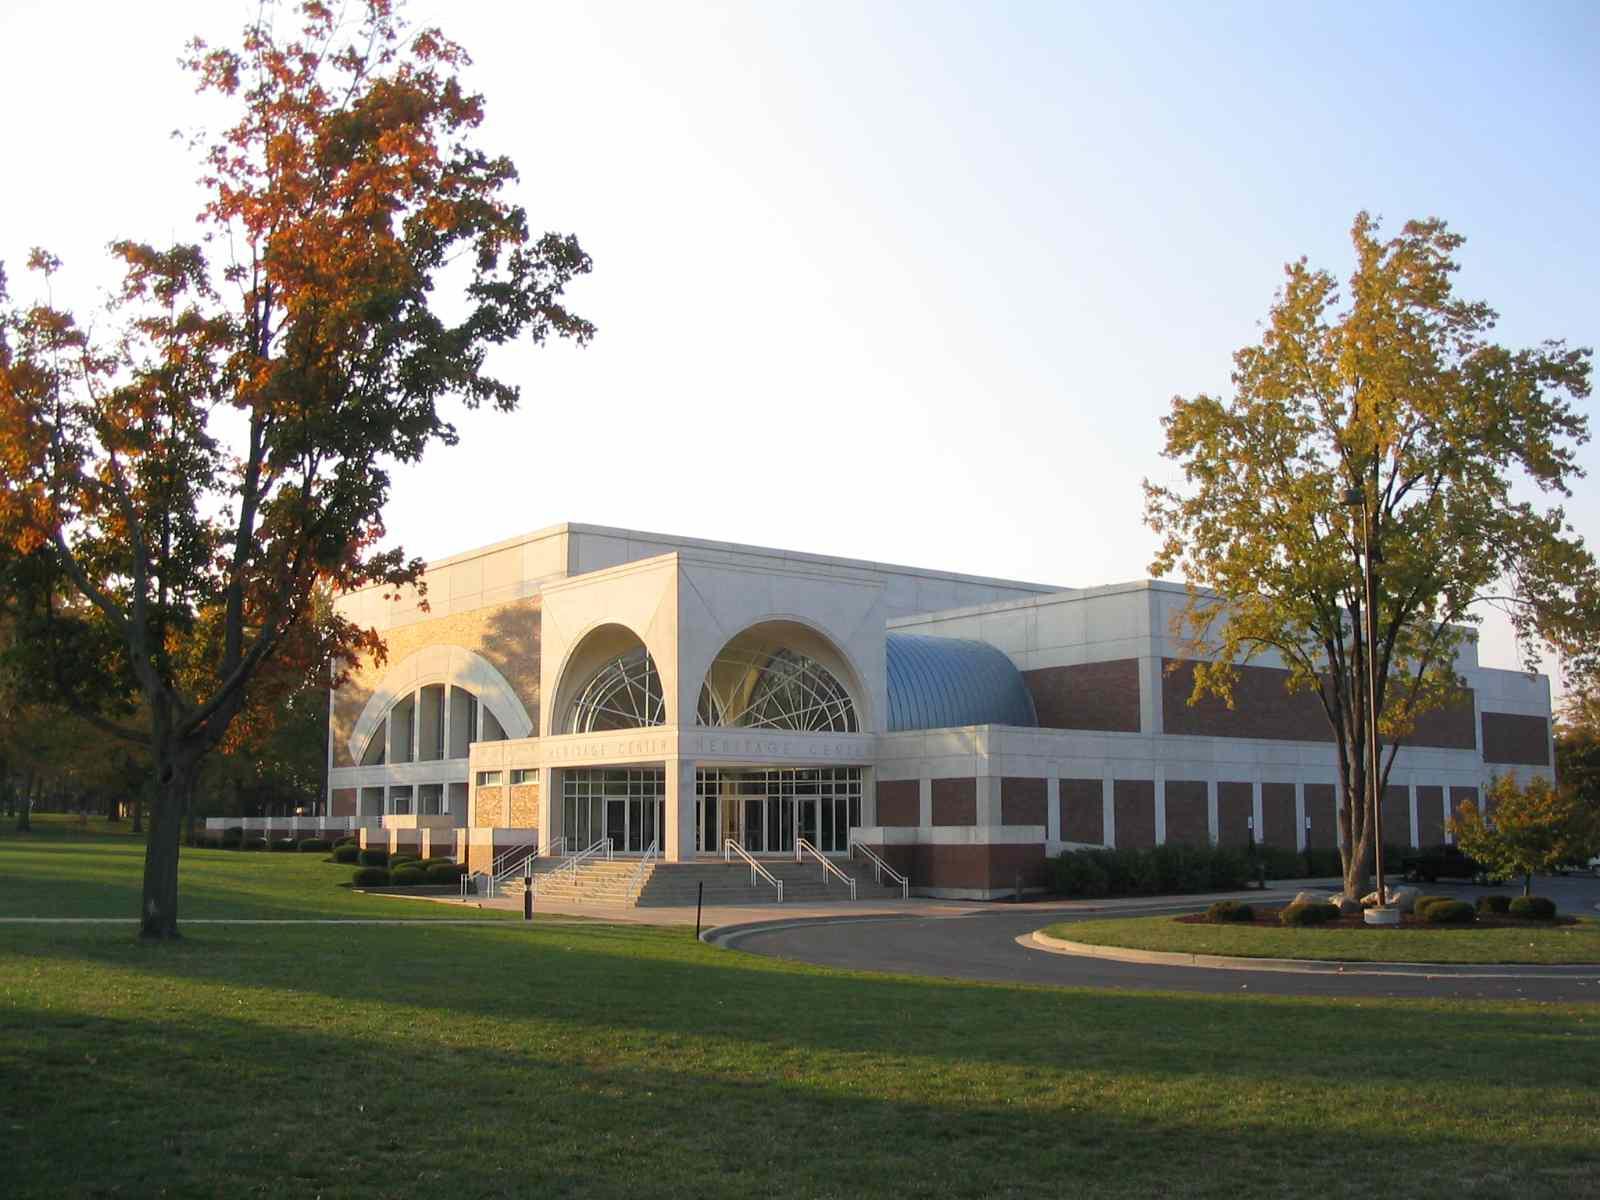 Oscar E. Remick Heritage Center at Alma College